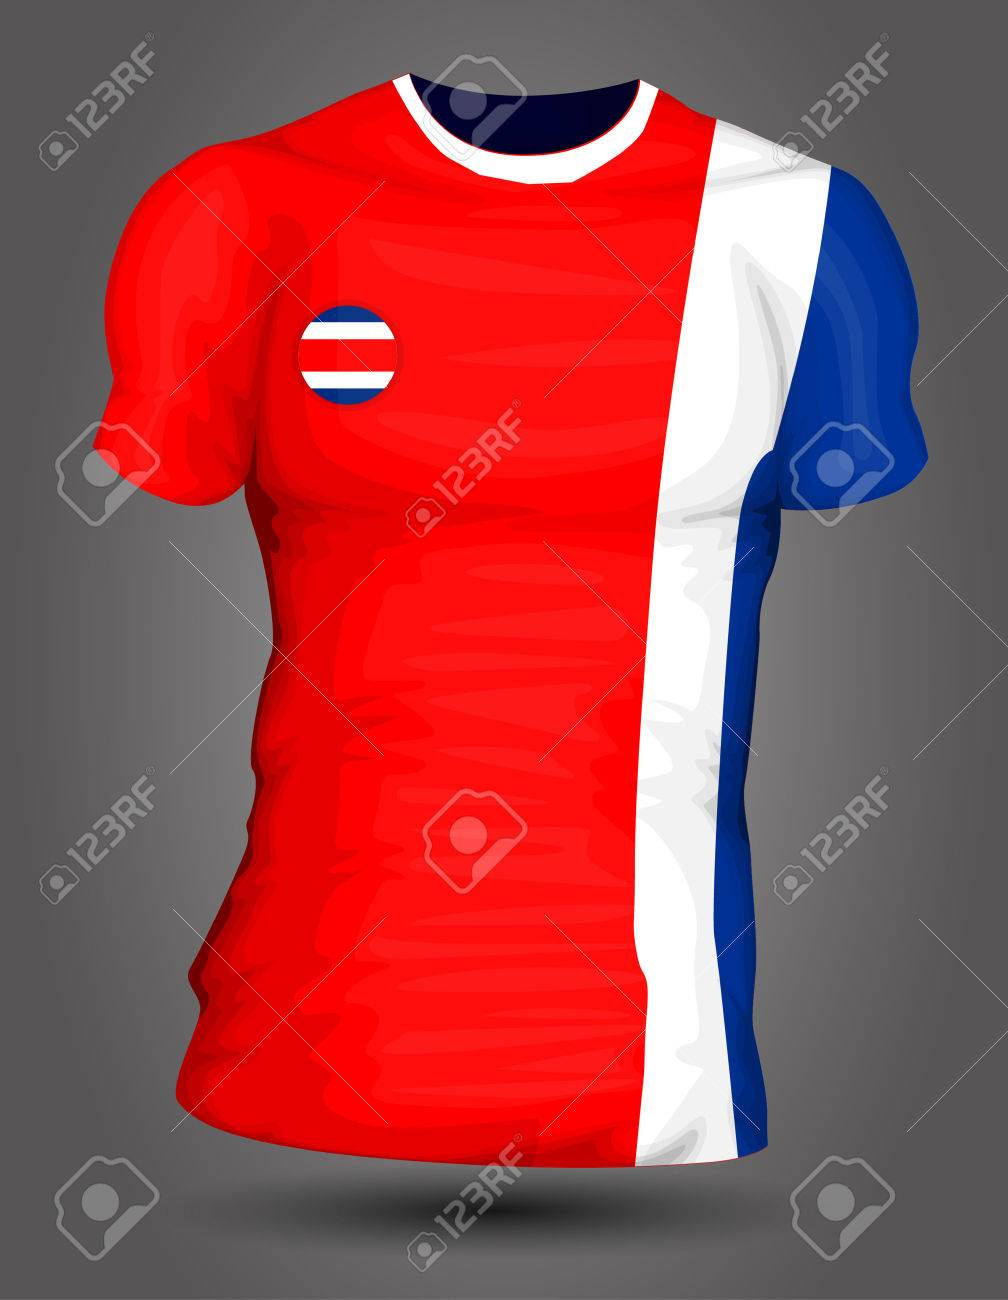 eb9973db9 Costa Rica soccer jersey Stock Vector - 27320408